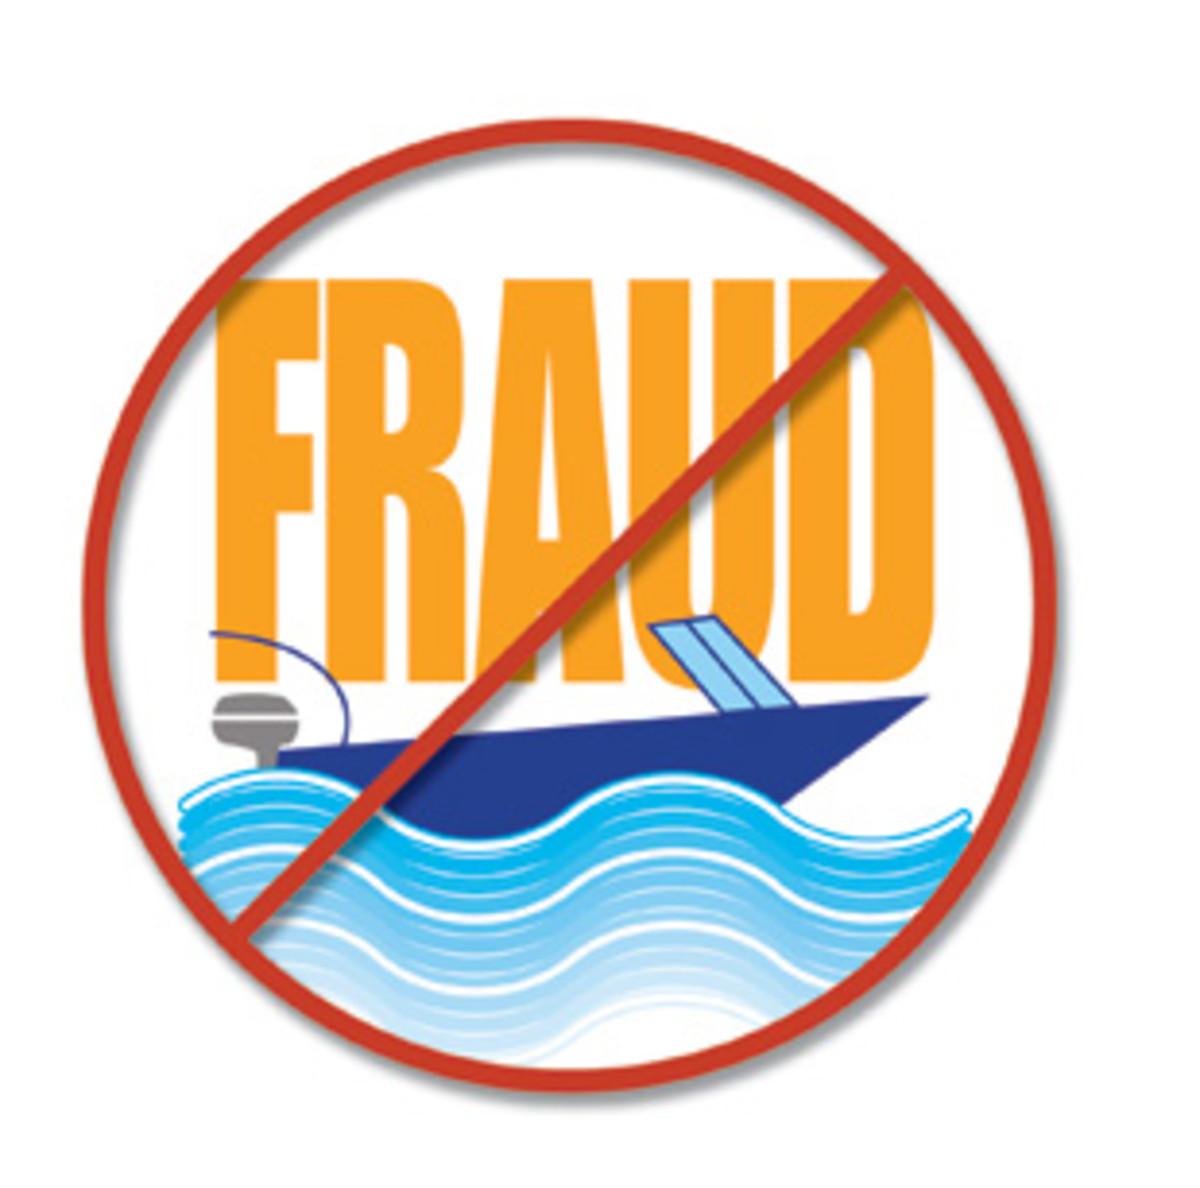 fraud-logo